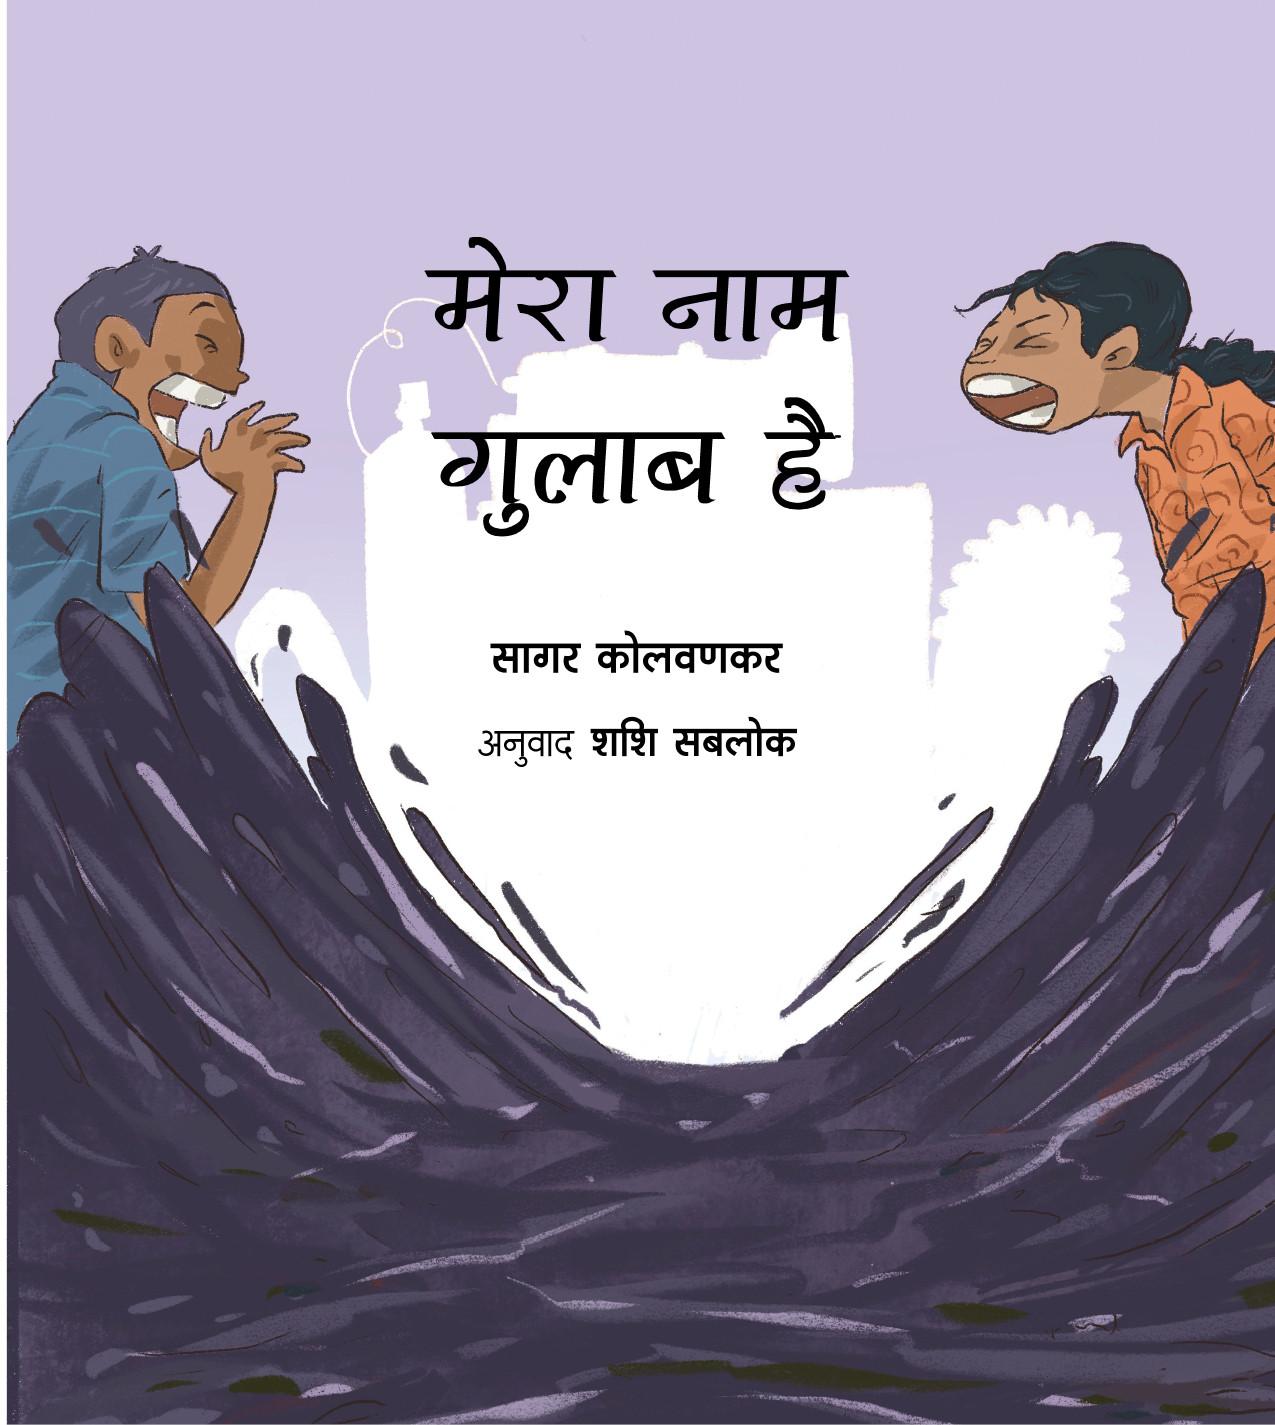 My Name is Gulab / Mera Naam Gulab Hai (Hindi)